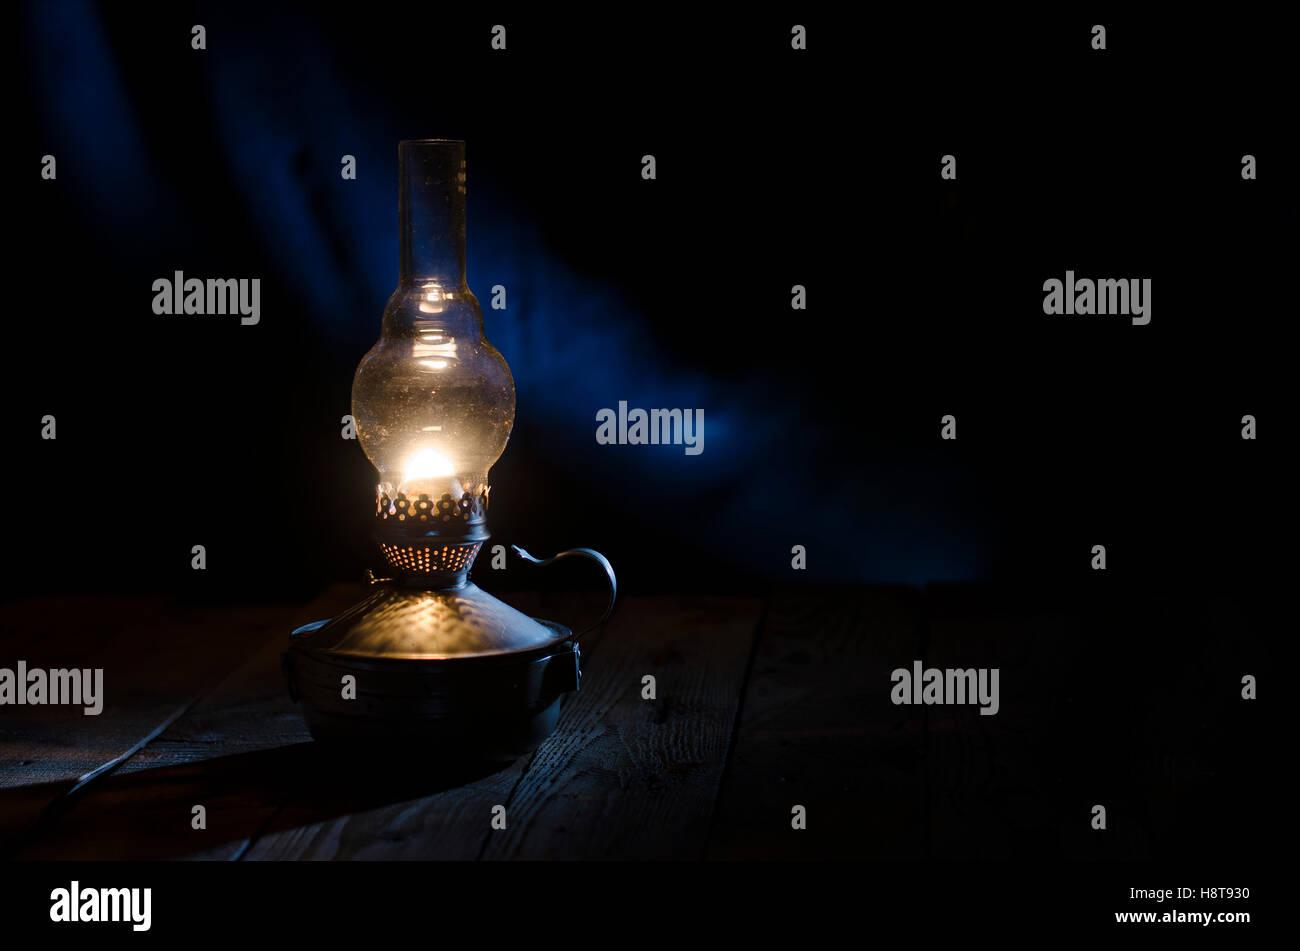 Old kerosene lamp on the rough wooden table. - Stock Image